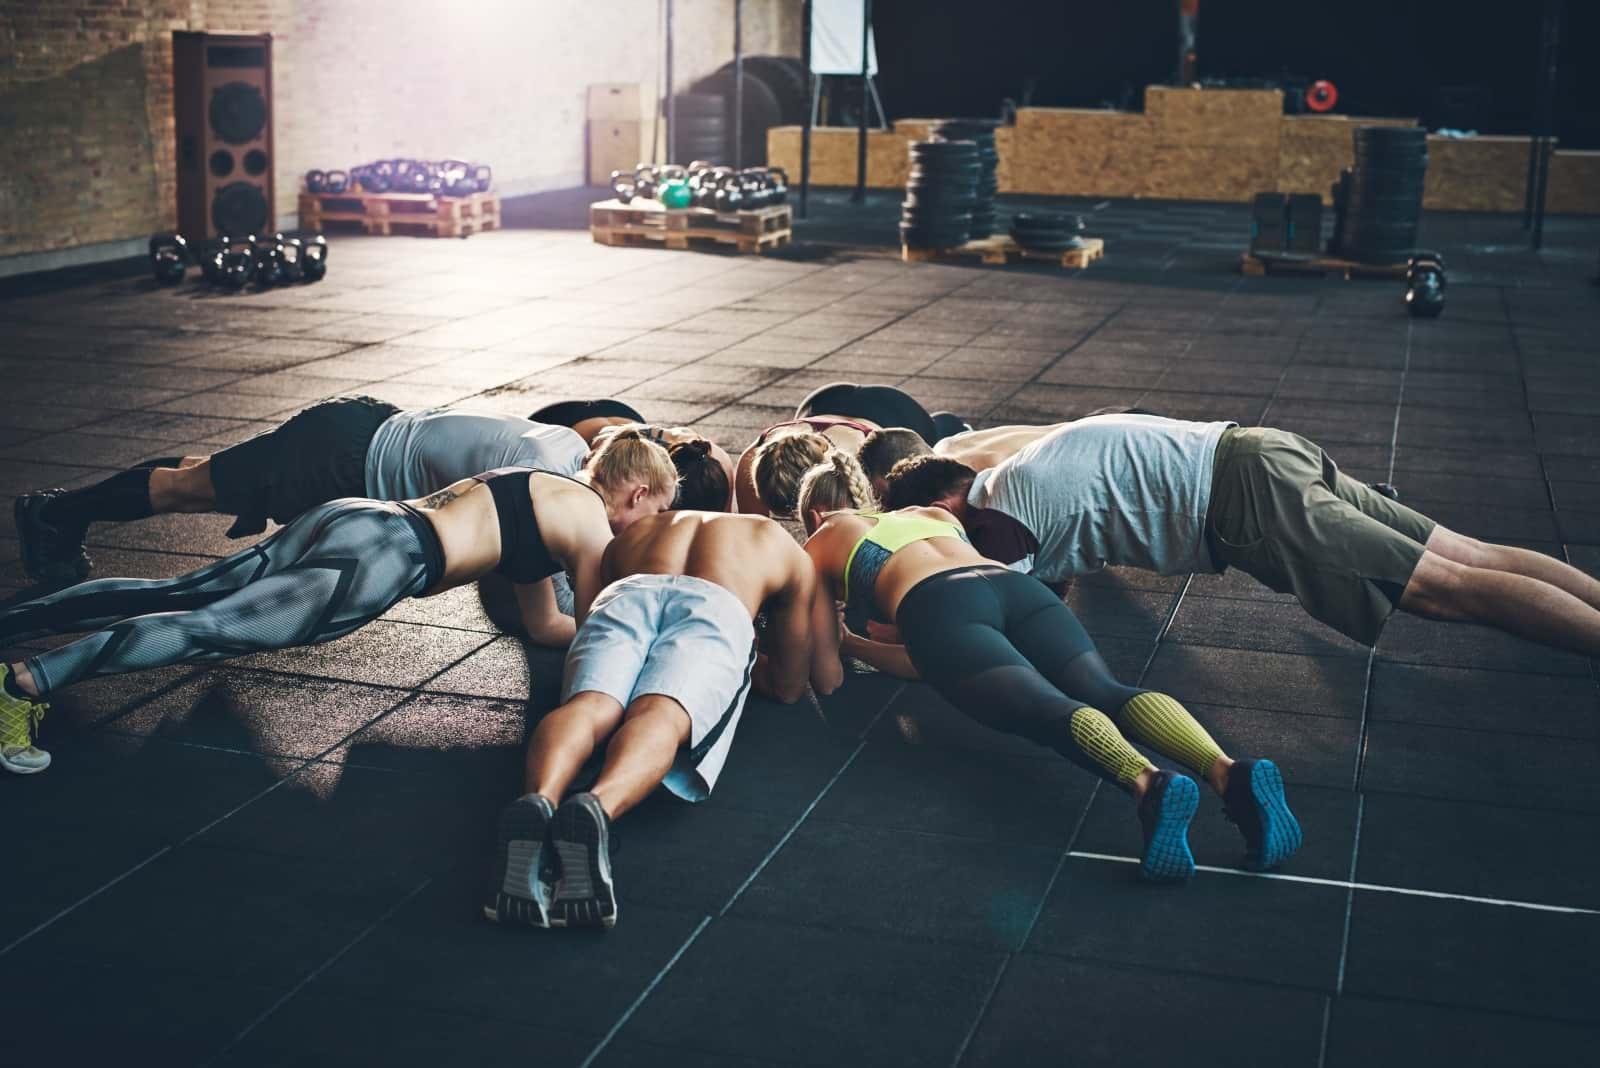 PatrickvanHoewijk.nl | Personal training | Lifestyle | Outdoor